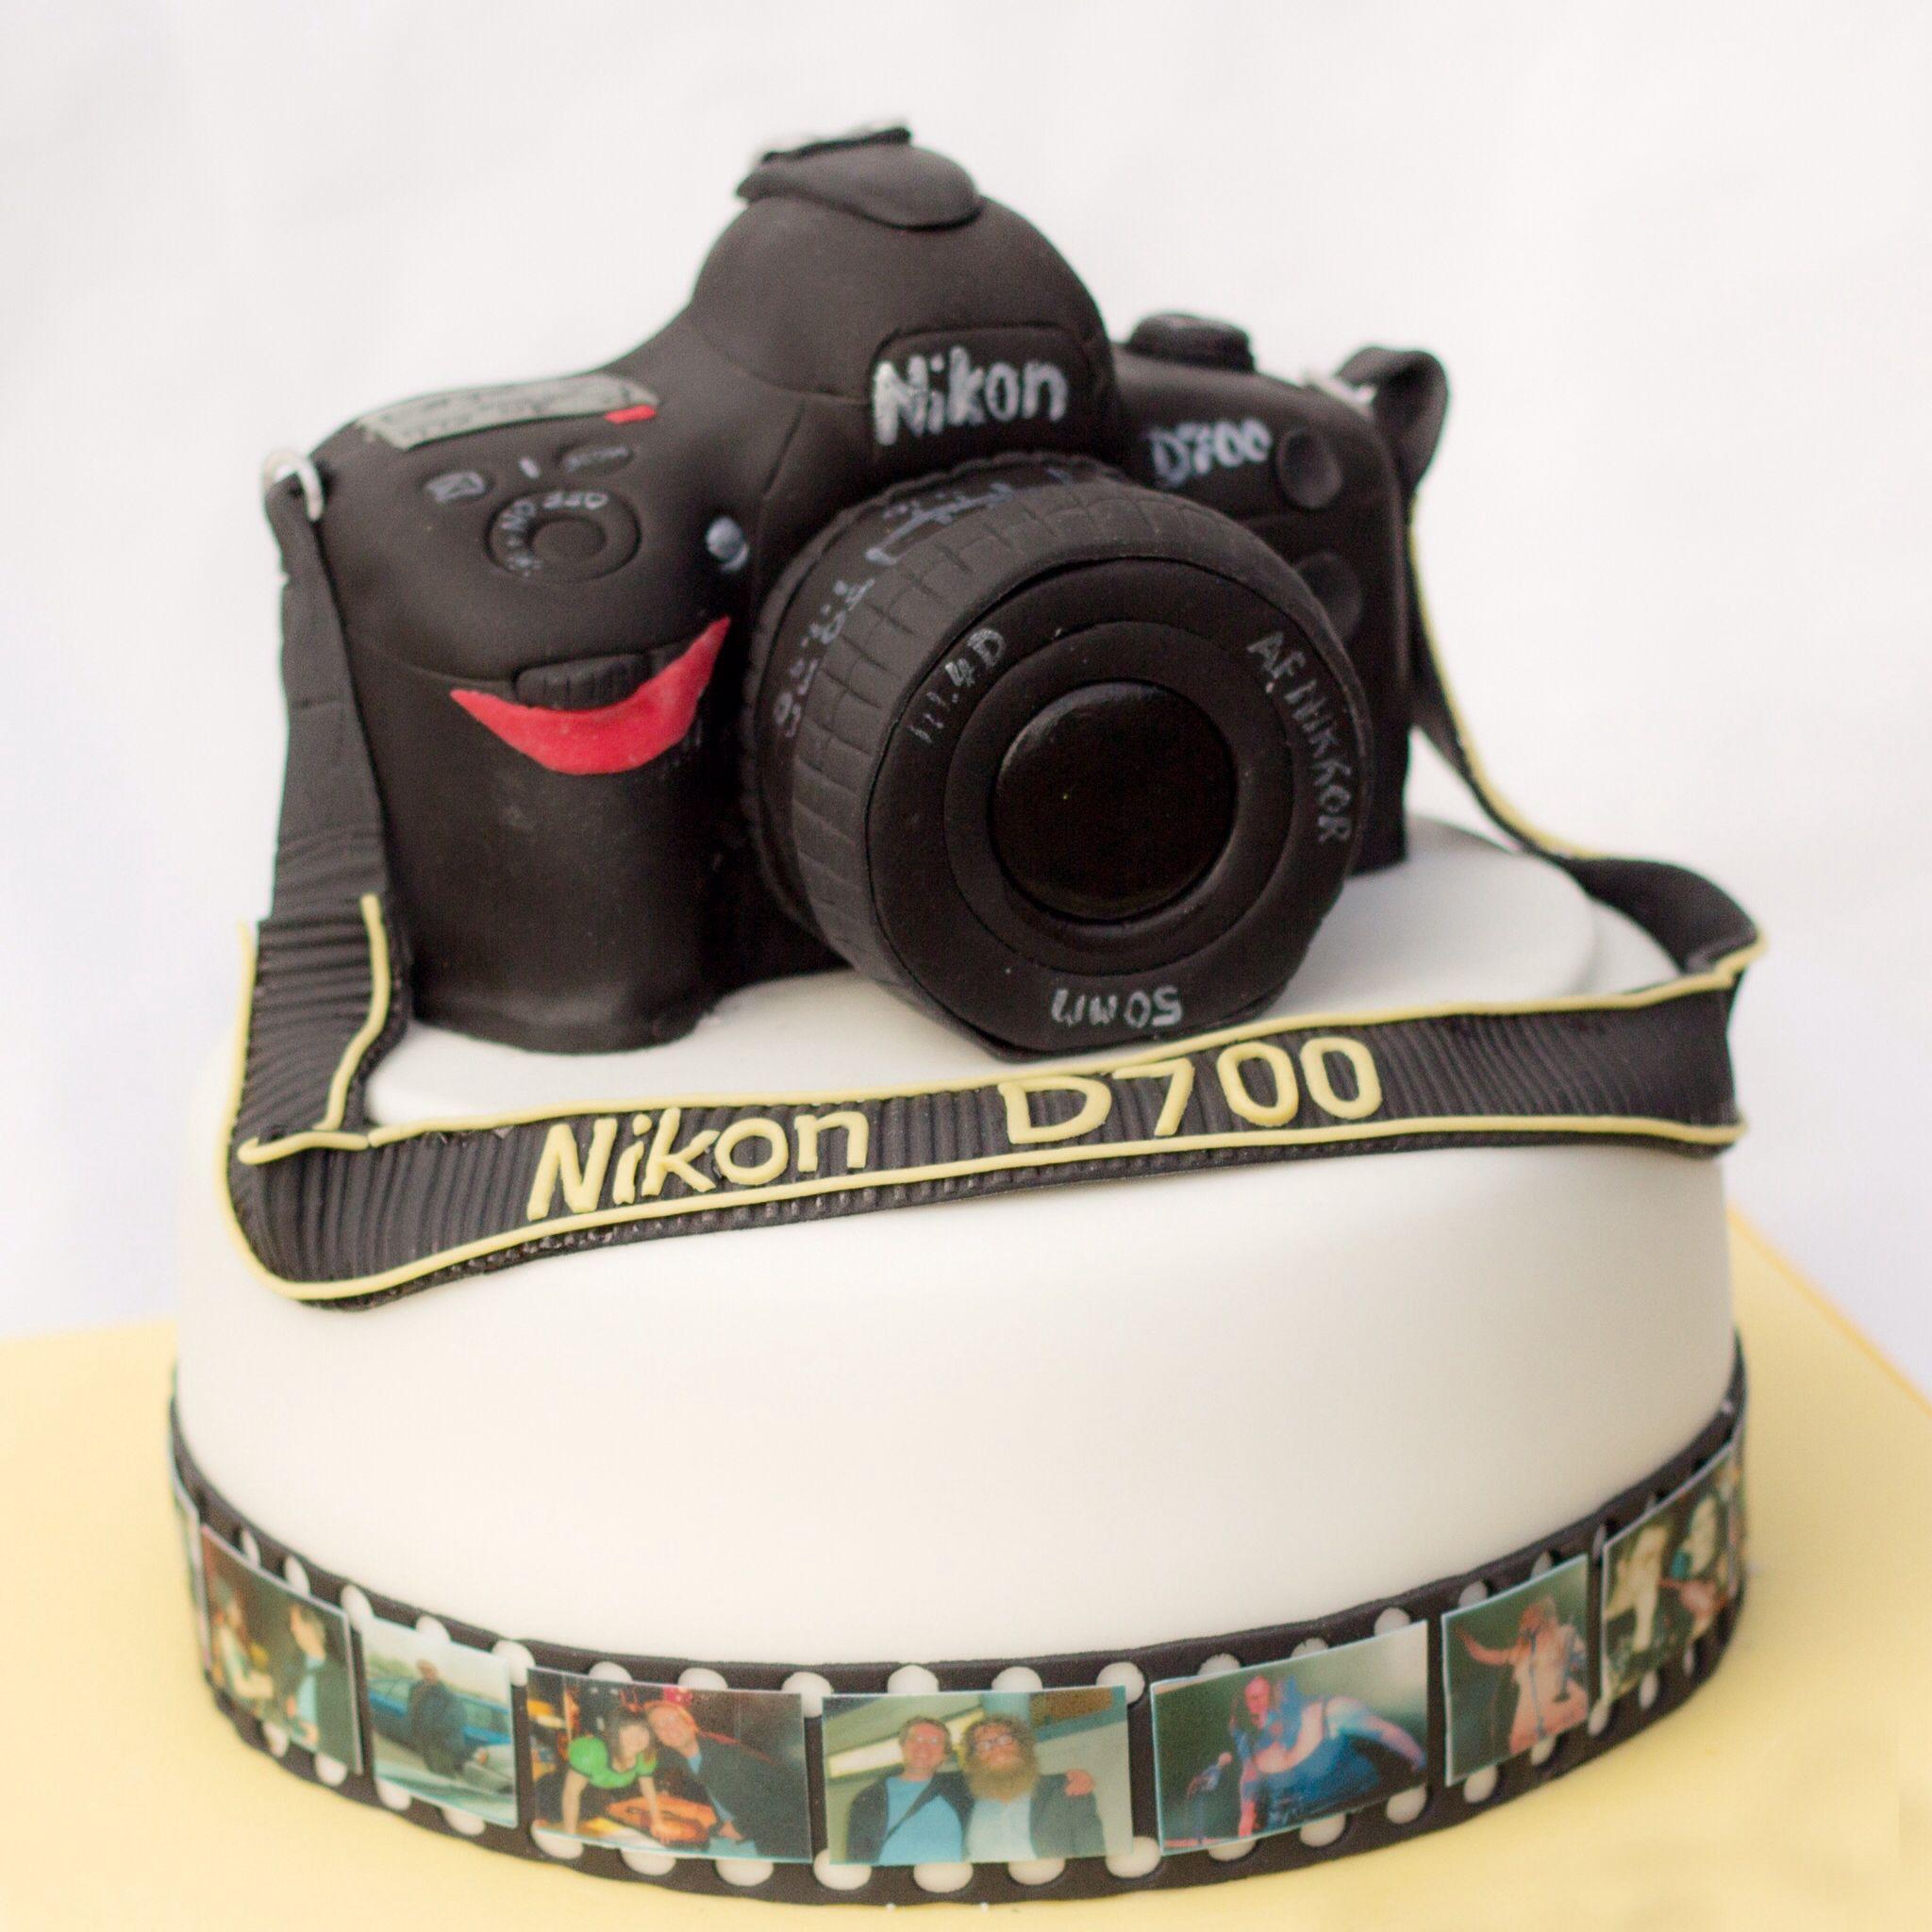 Nikon Camera Cake Images : Nikon camera cake Cake Pinterest